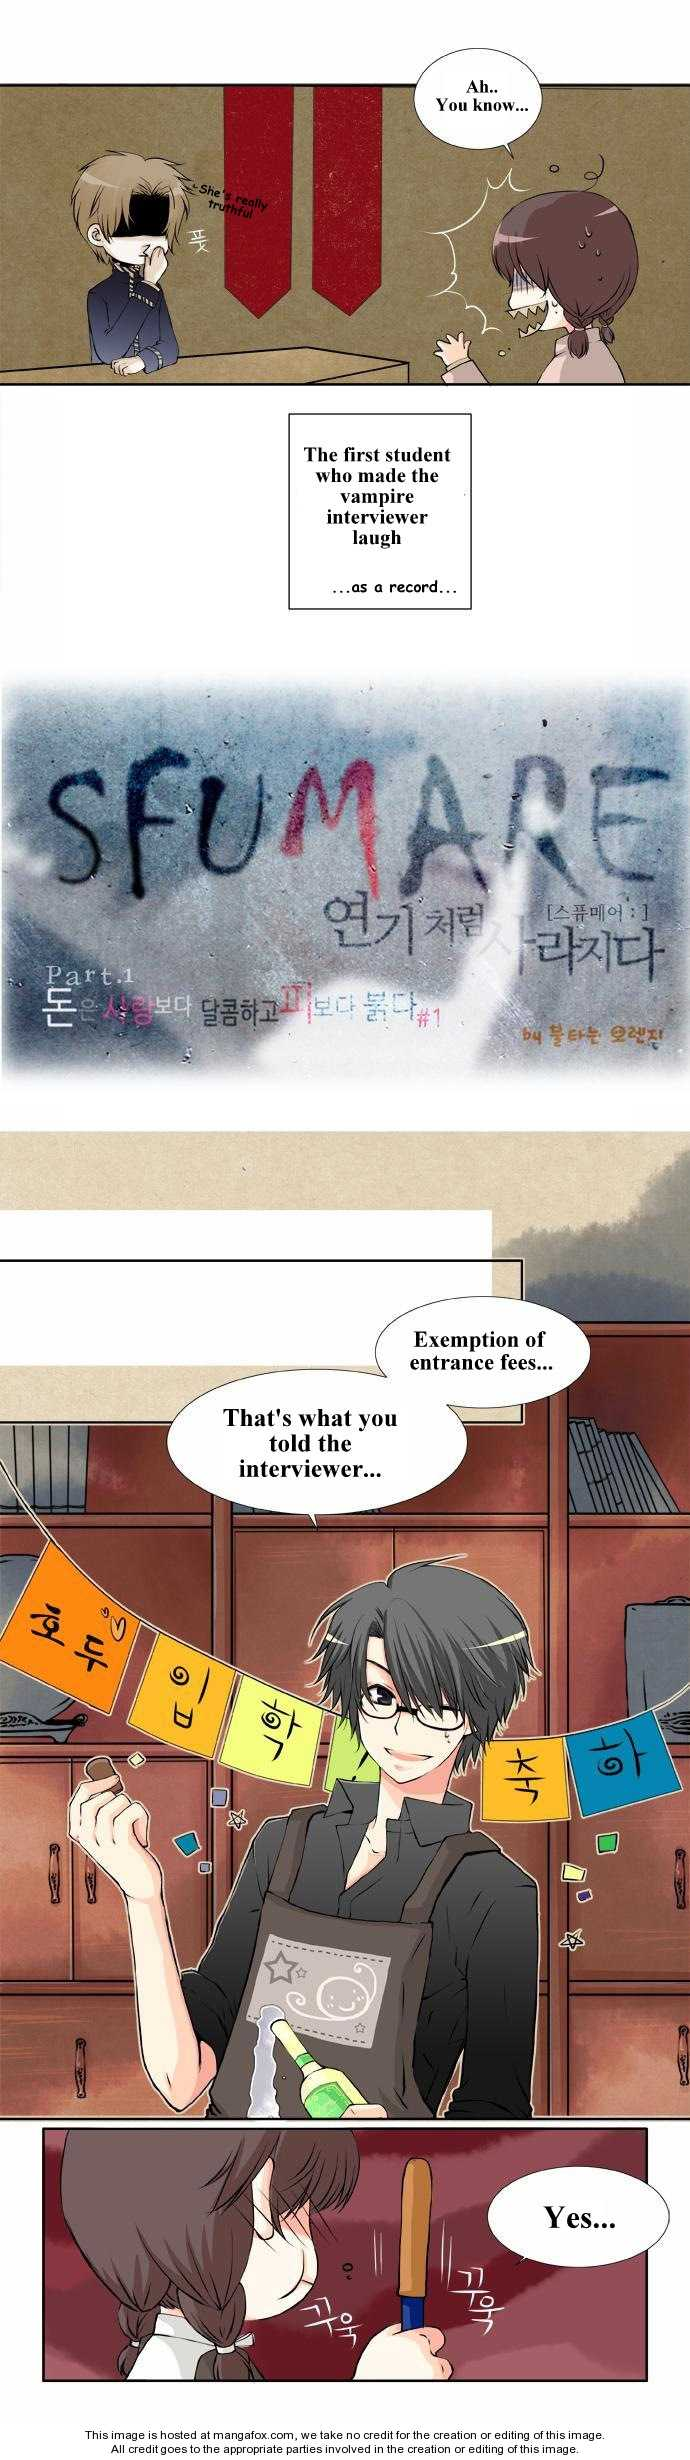 Sfumare 1 Page 2